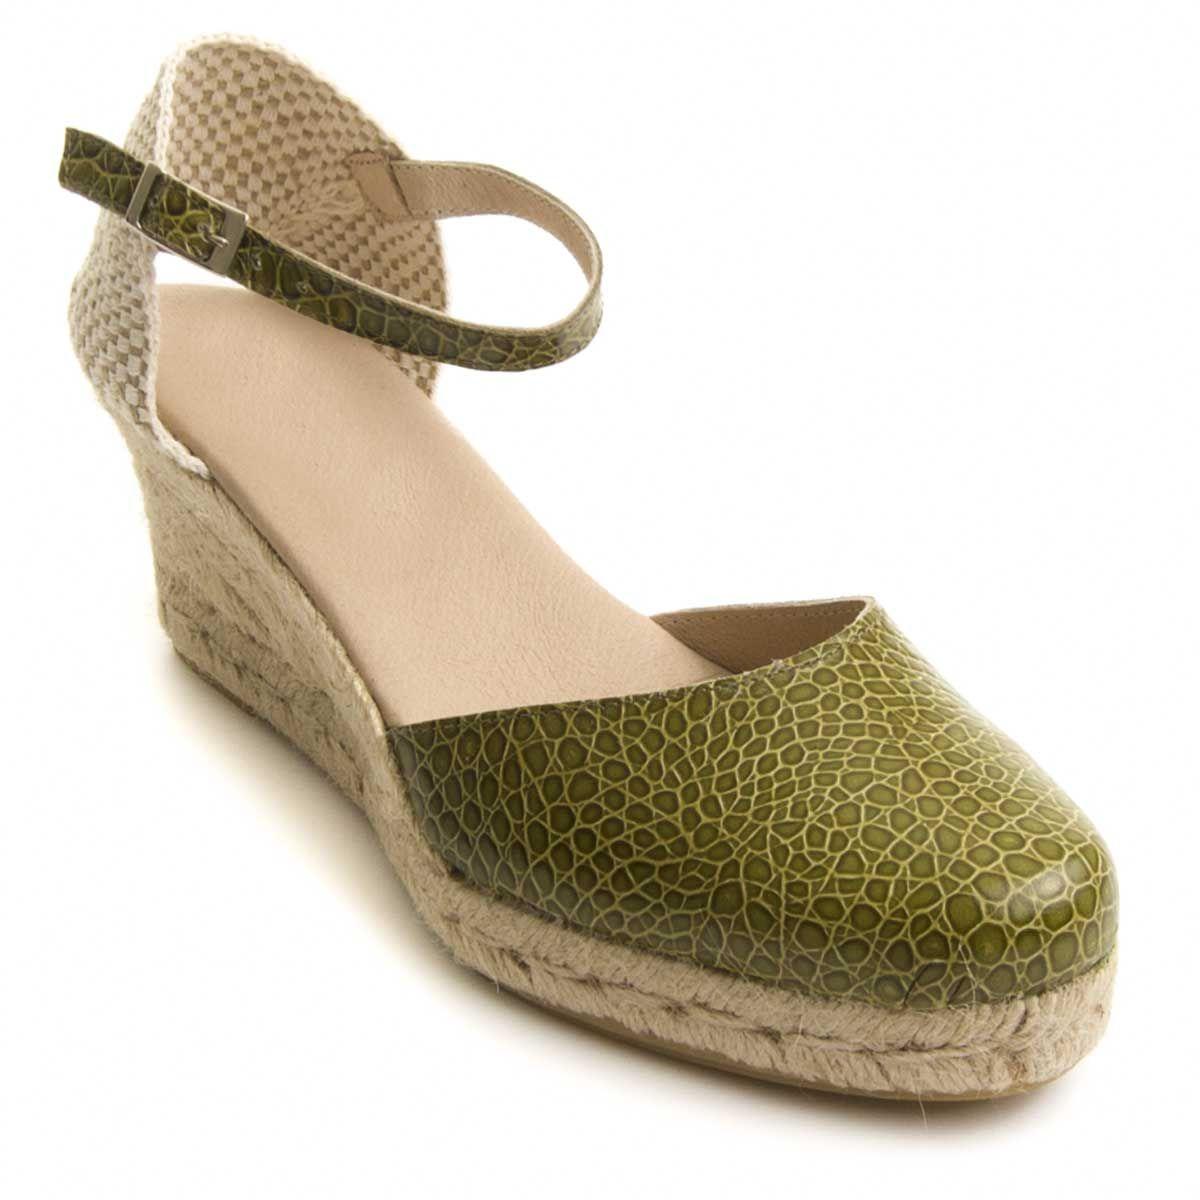 Montevita Ankle Strap Wedge Espadrille in Green